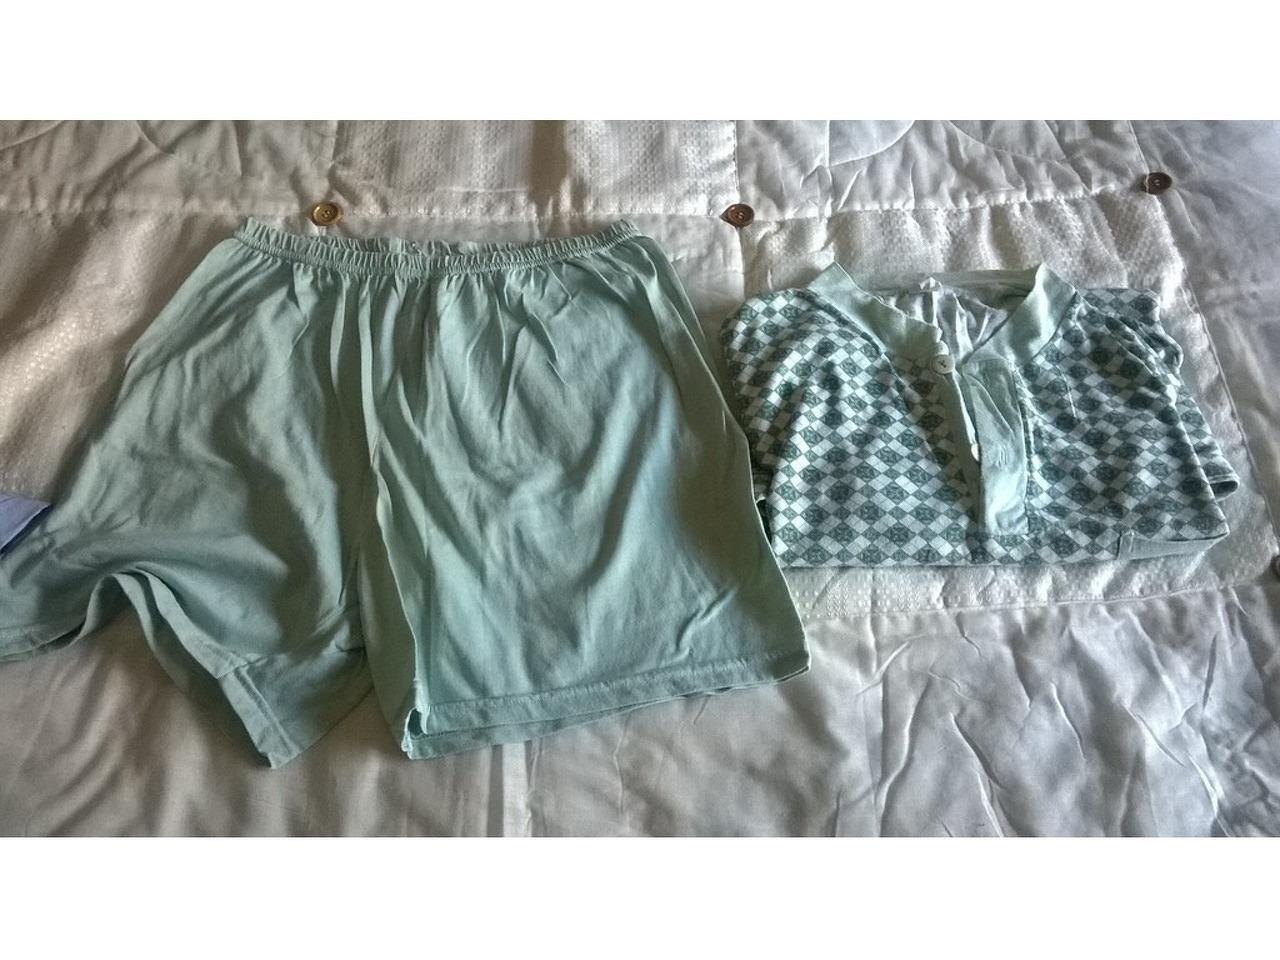 Pijamas (segunda mão) - 4/12